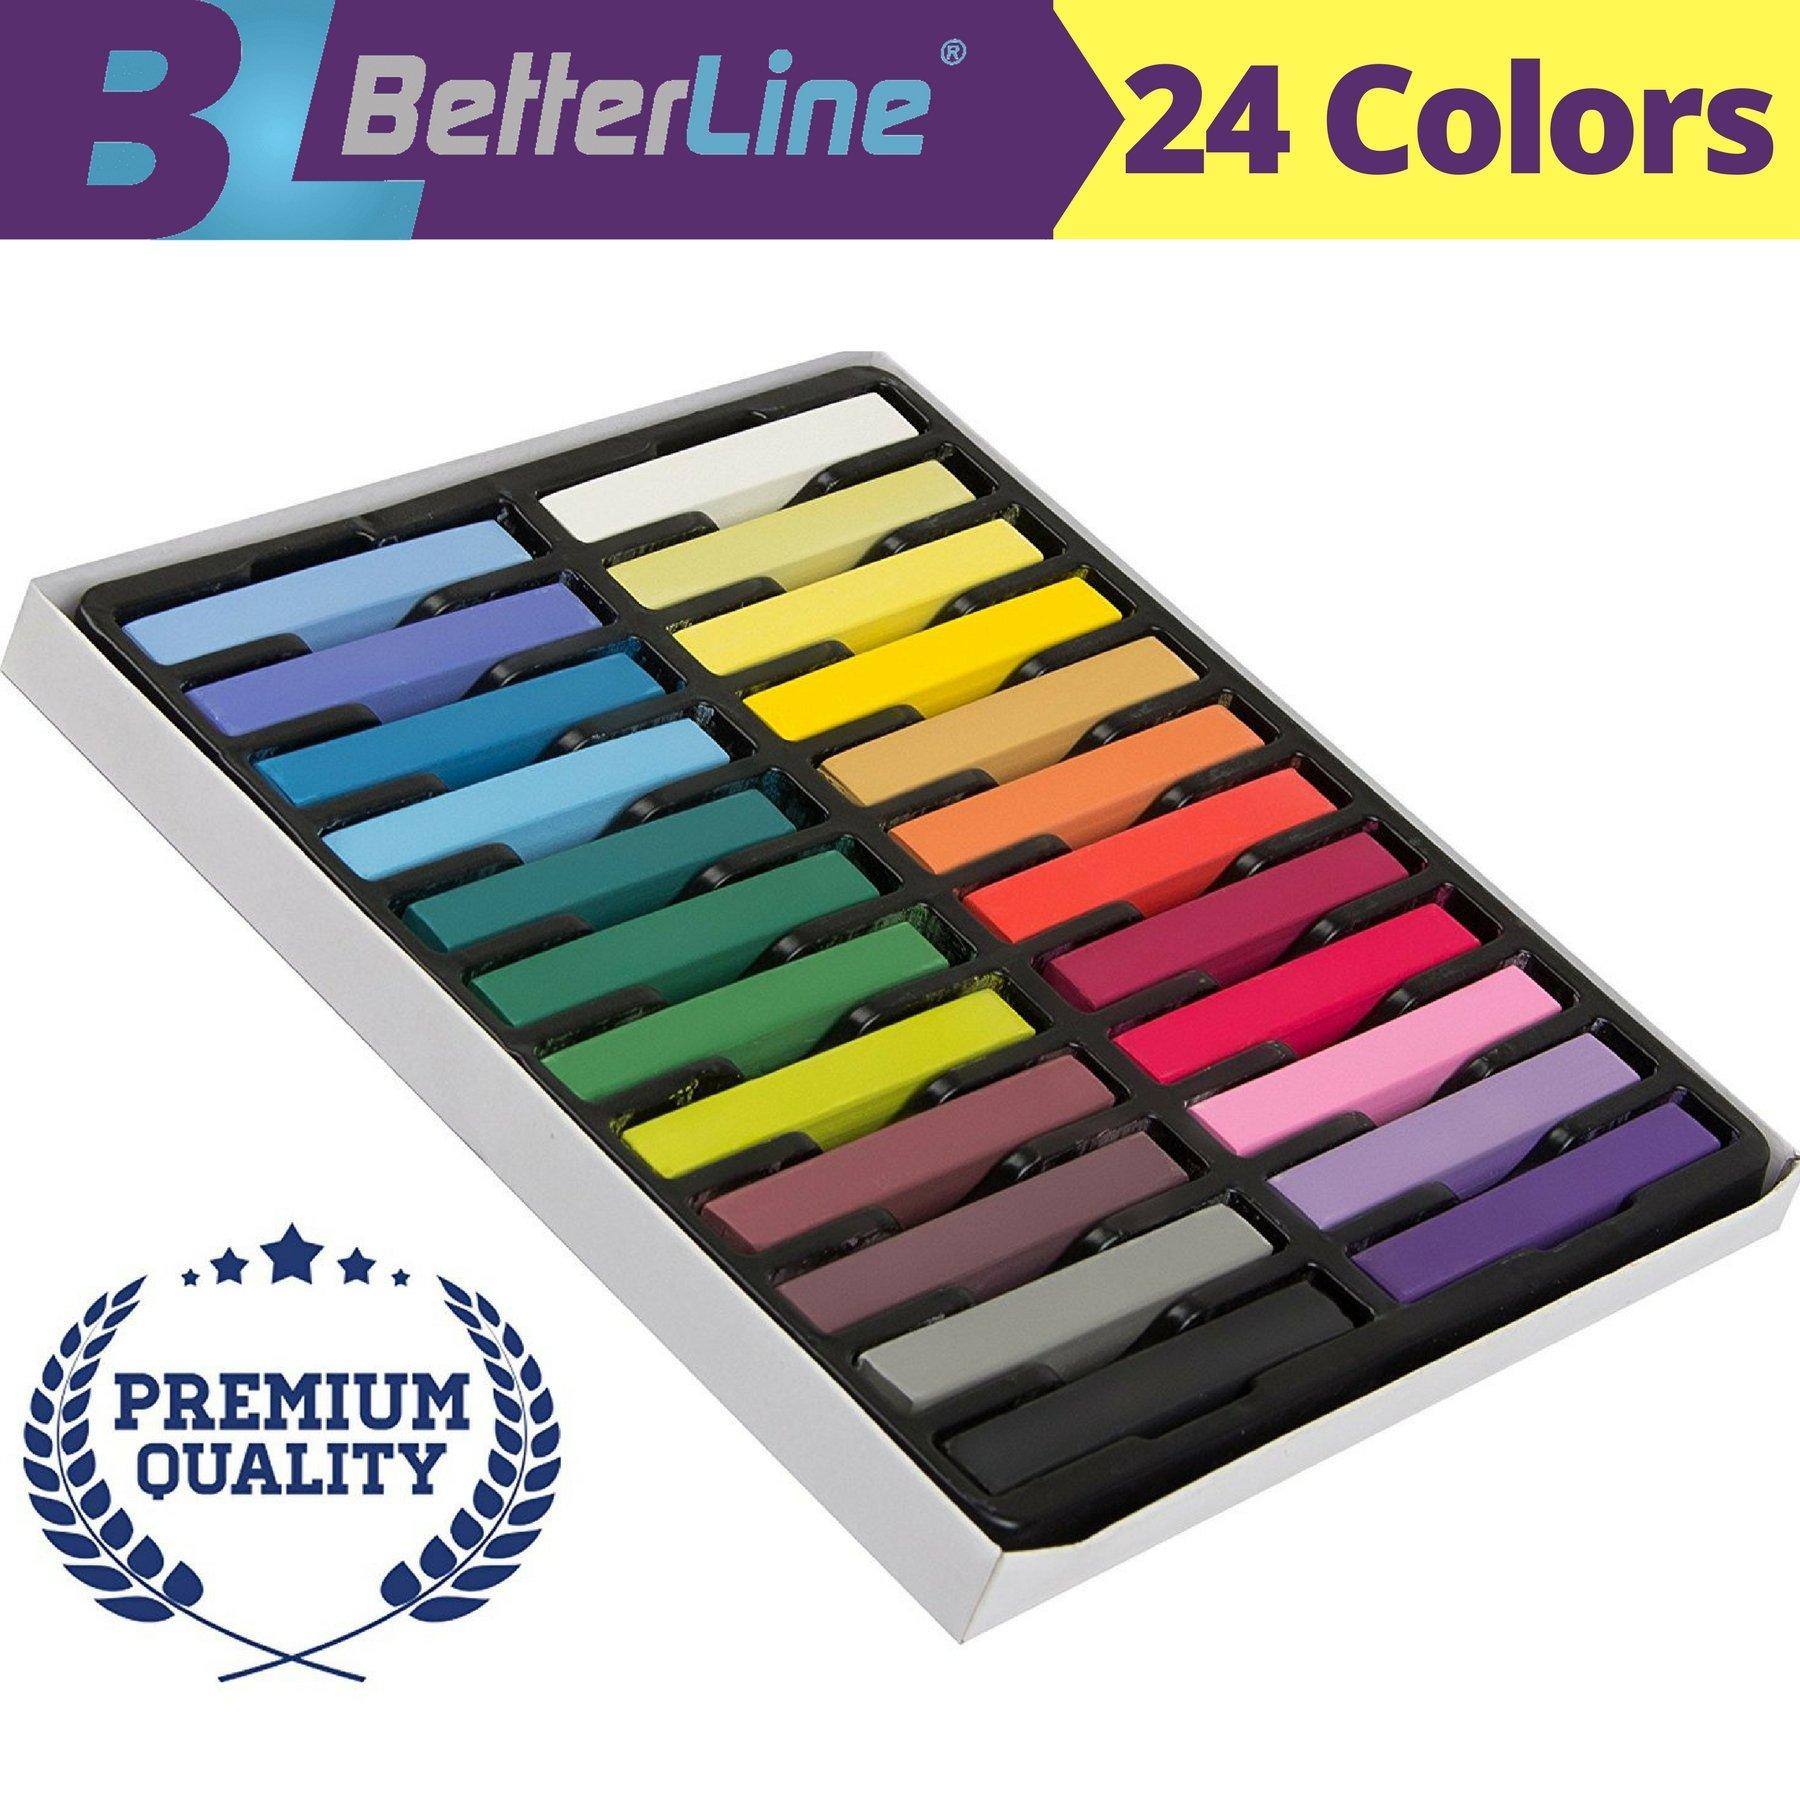 Hair Chalk Set - Temporary Flair for Your Hair (24 Colors)